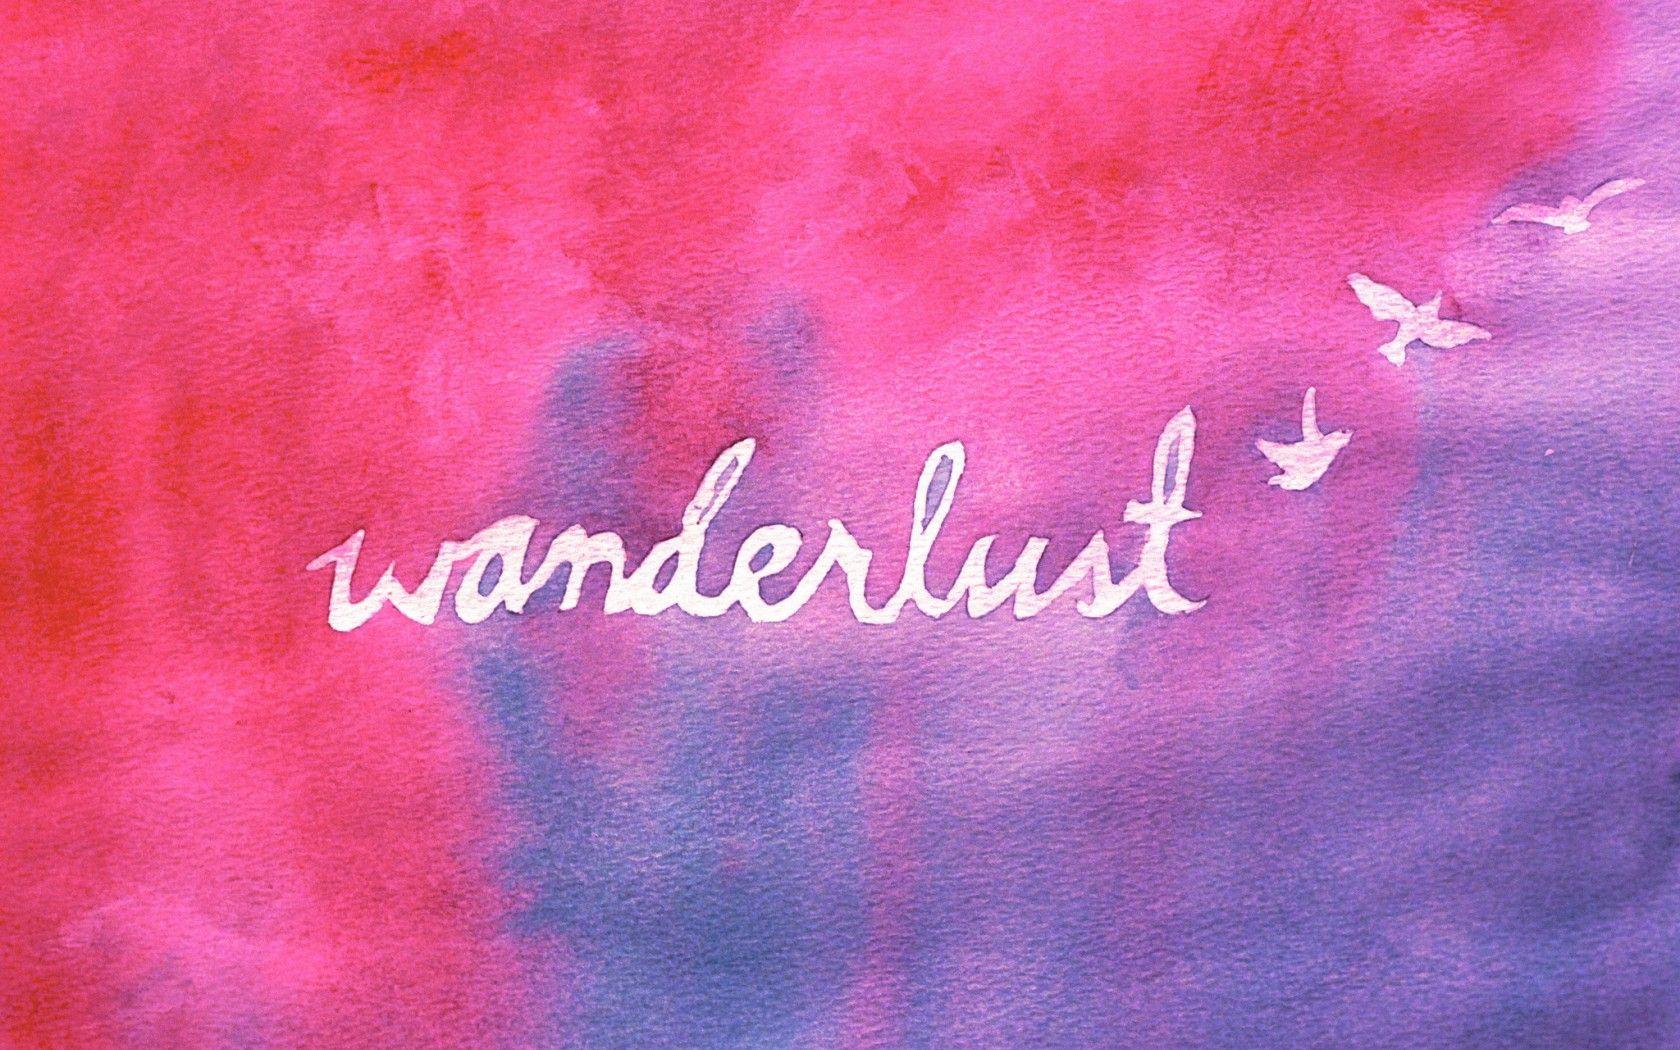 Wanderlust Desktop Wallpaper Hd Desktop Wallpaper Travel Map Diy Wanderlust Travel Journal Pages